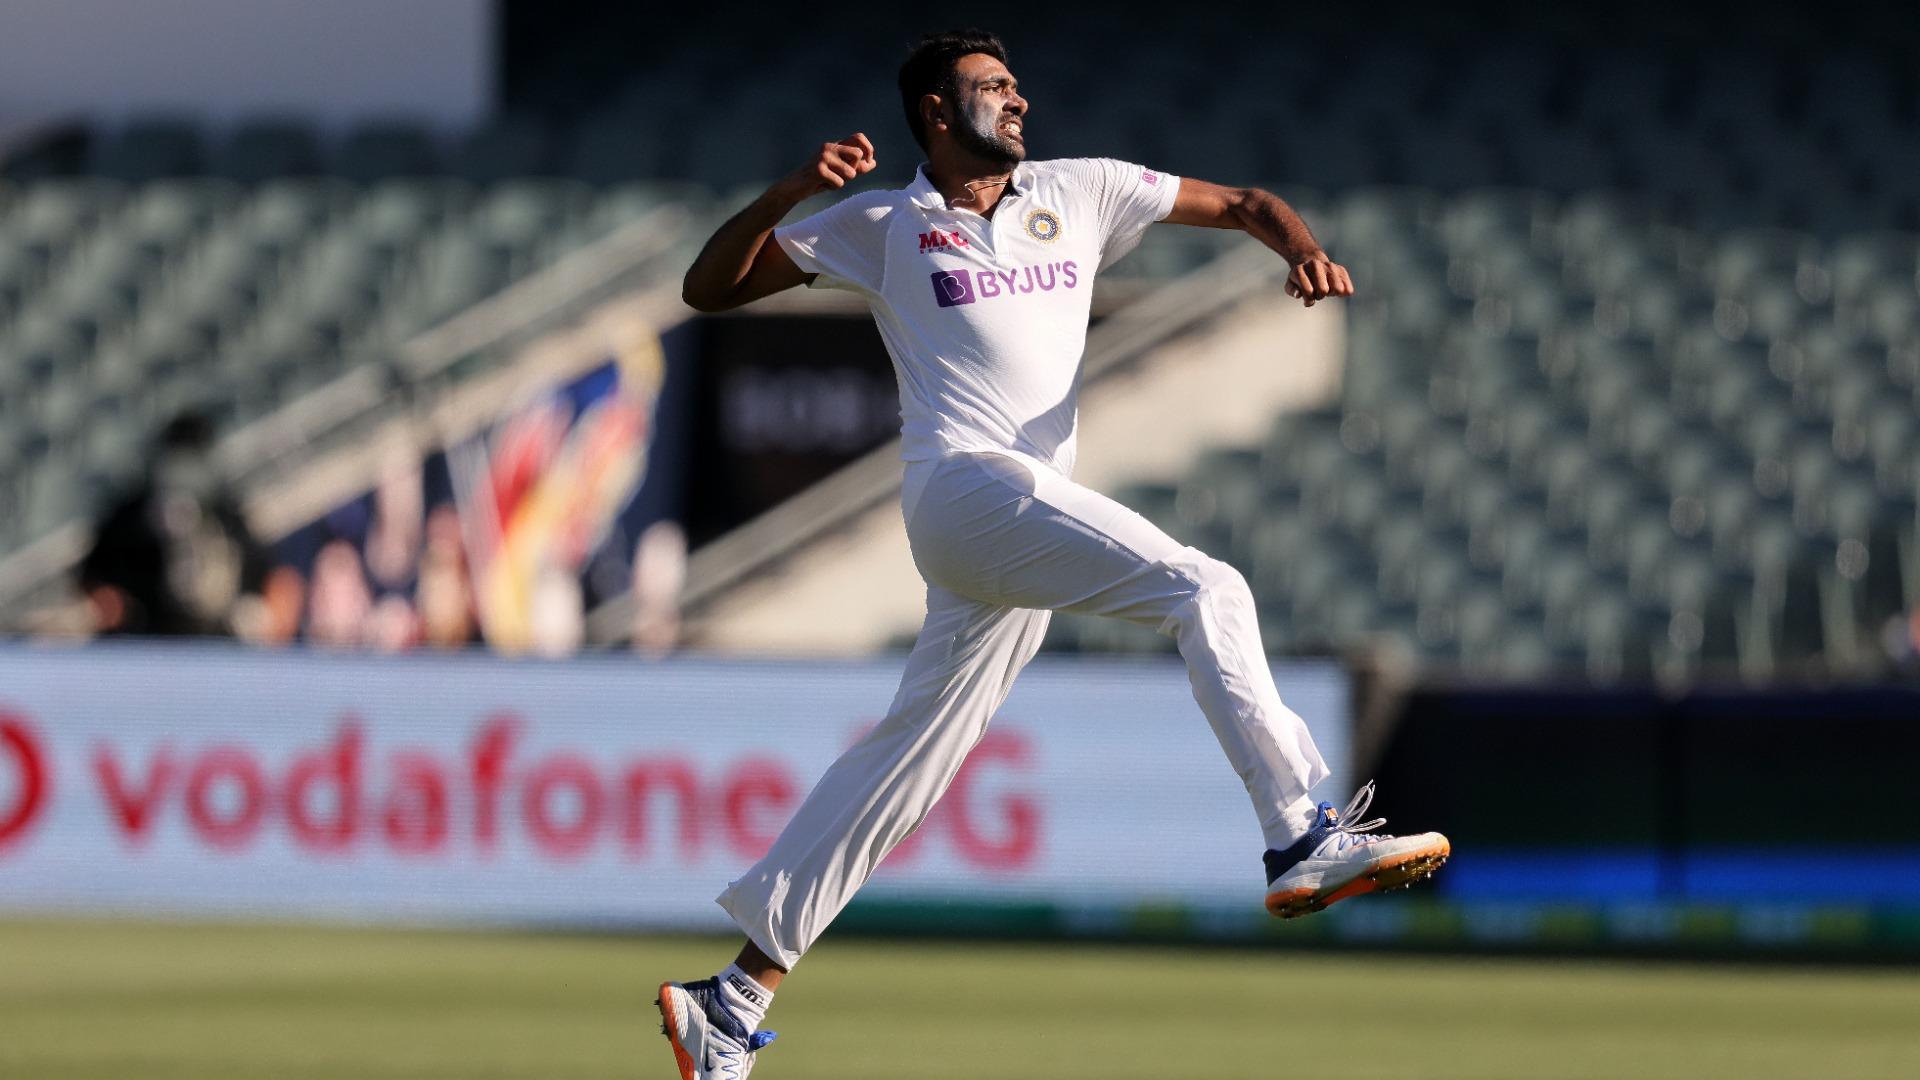 Kohli: No place for Ashwin in T20 squad while Sundar is shining